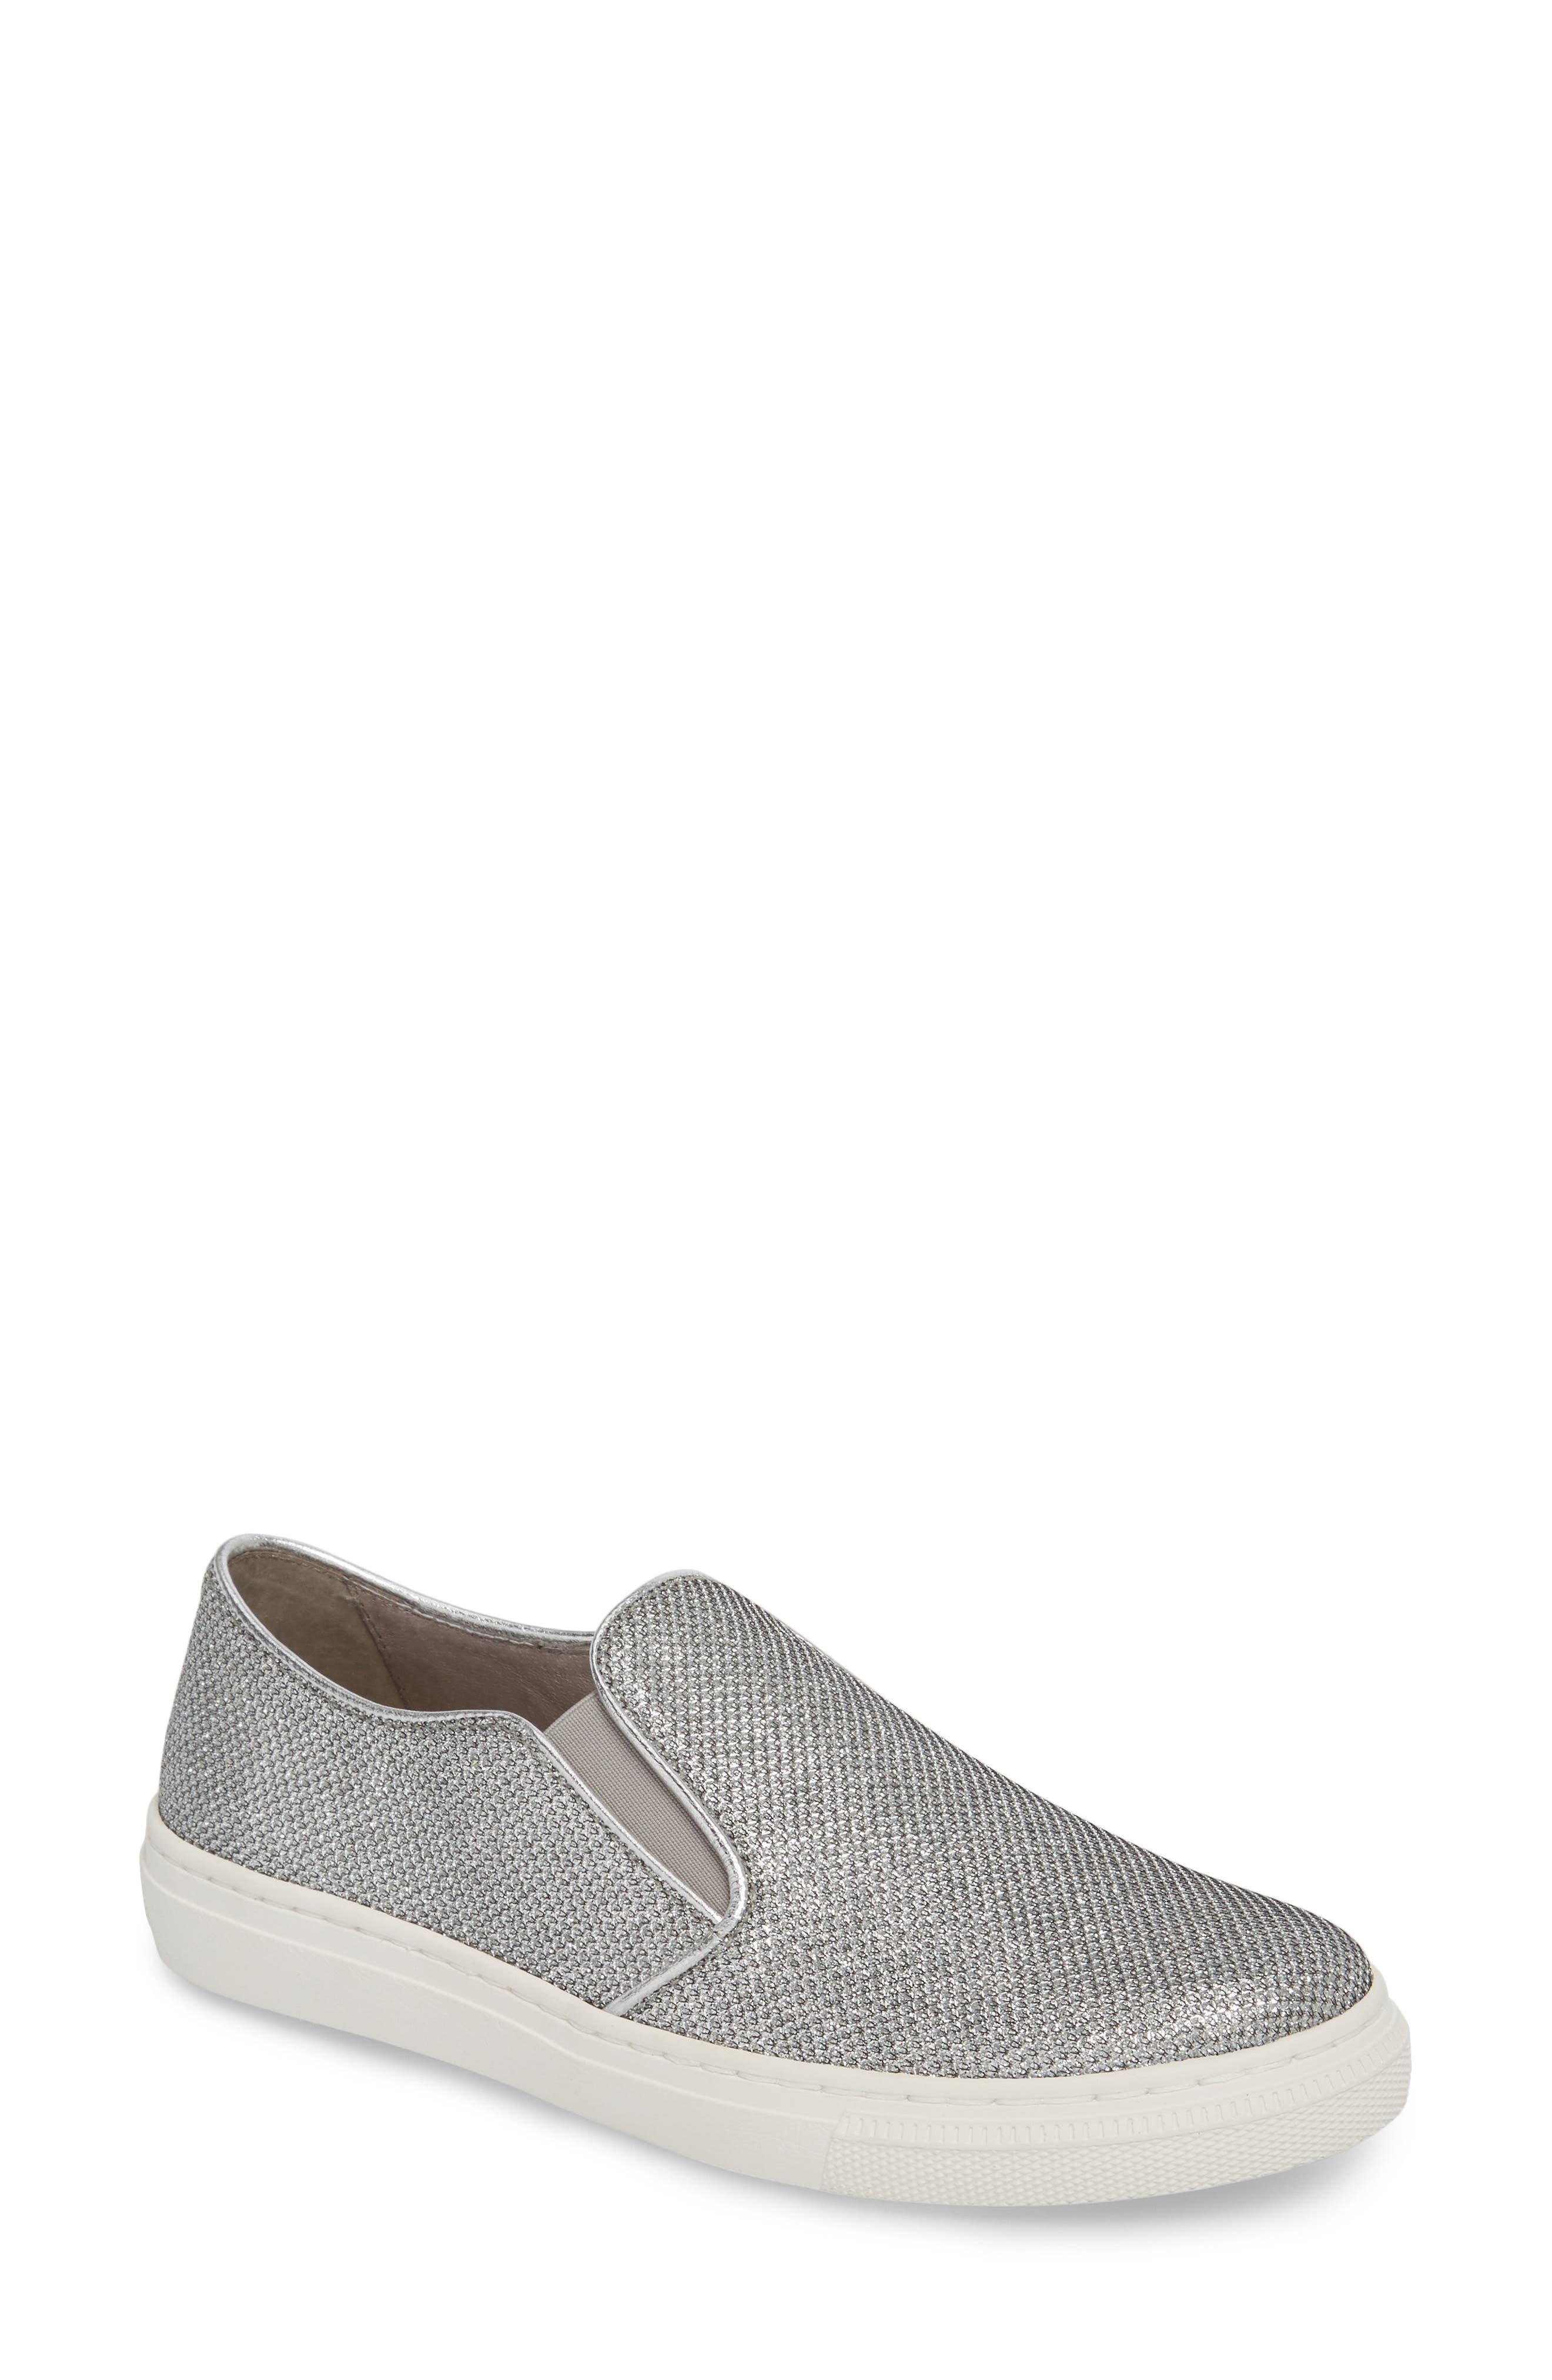 Garbor Fashion Slip-On Sneaker- Metallic